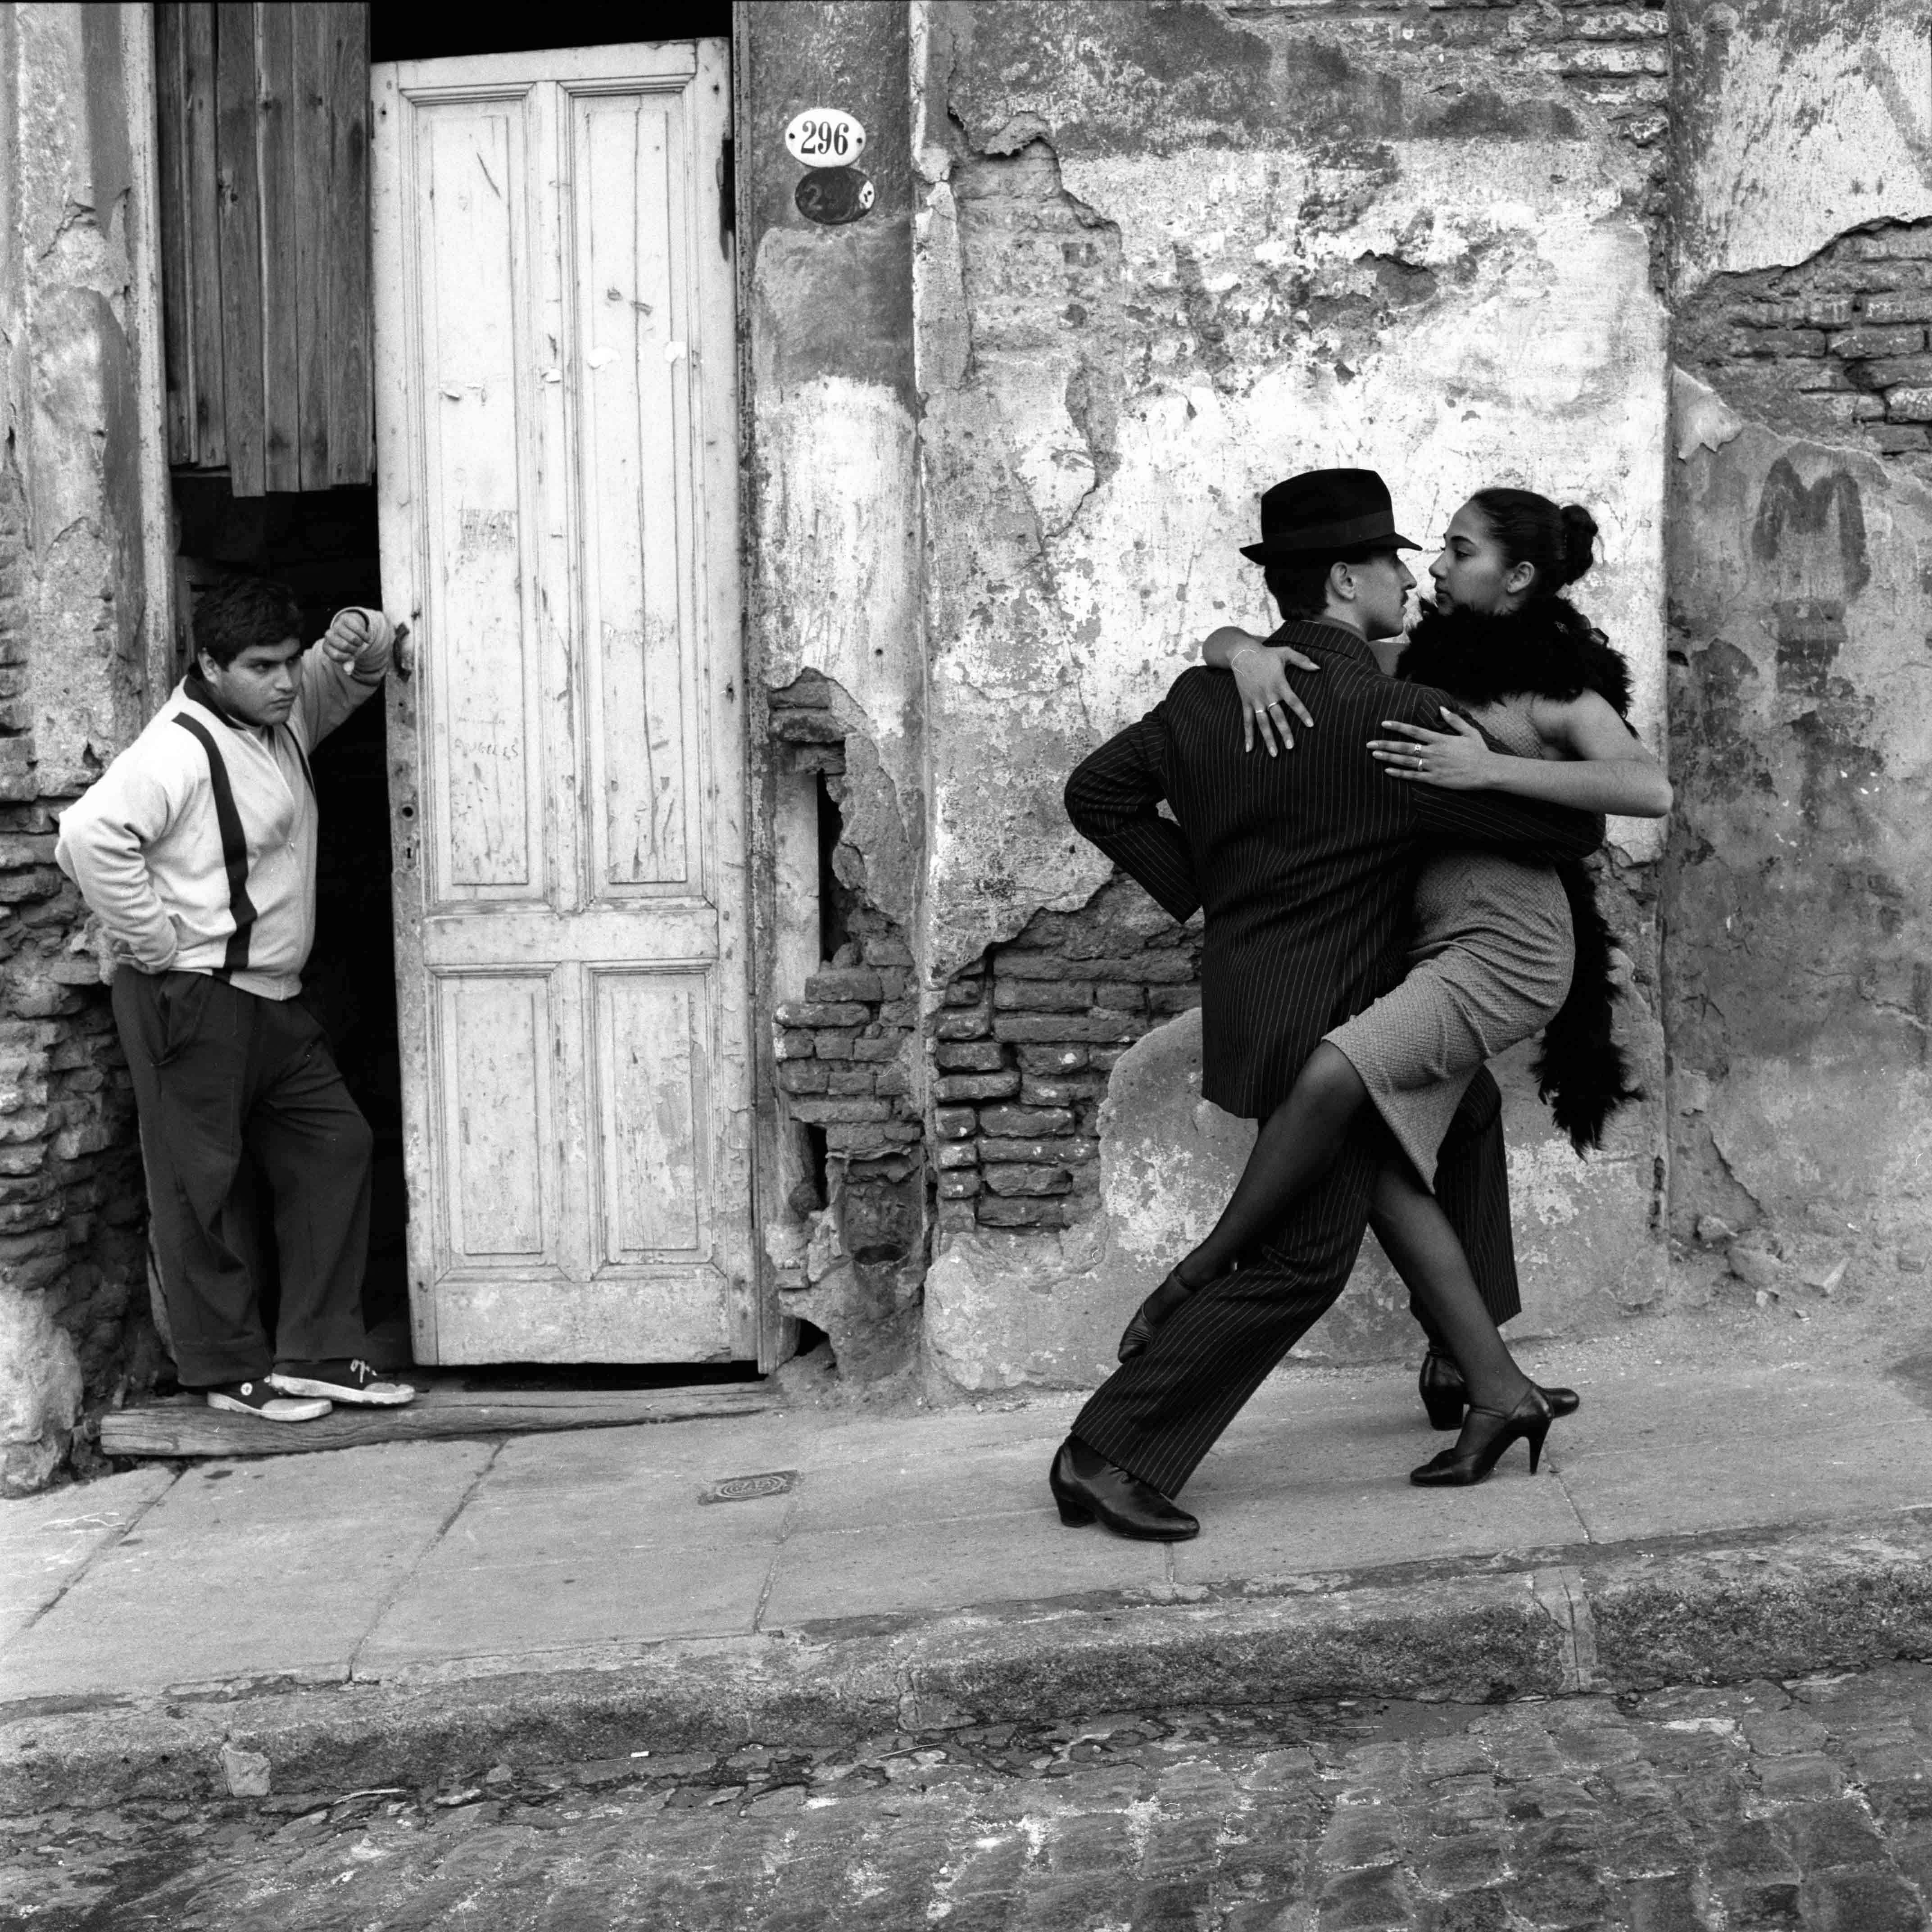 ST. Serie Tango, 1989<br/>Platinotipia / Platinum